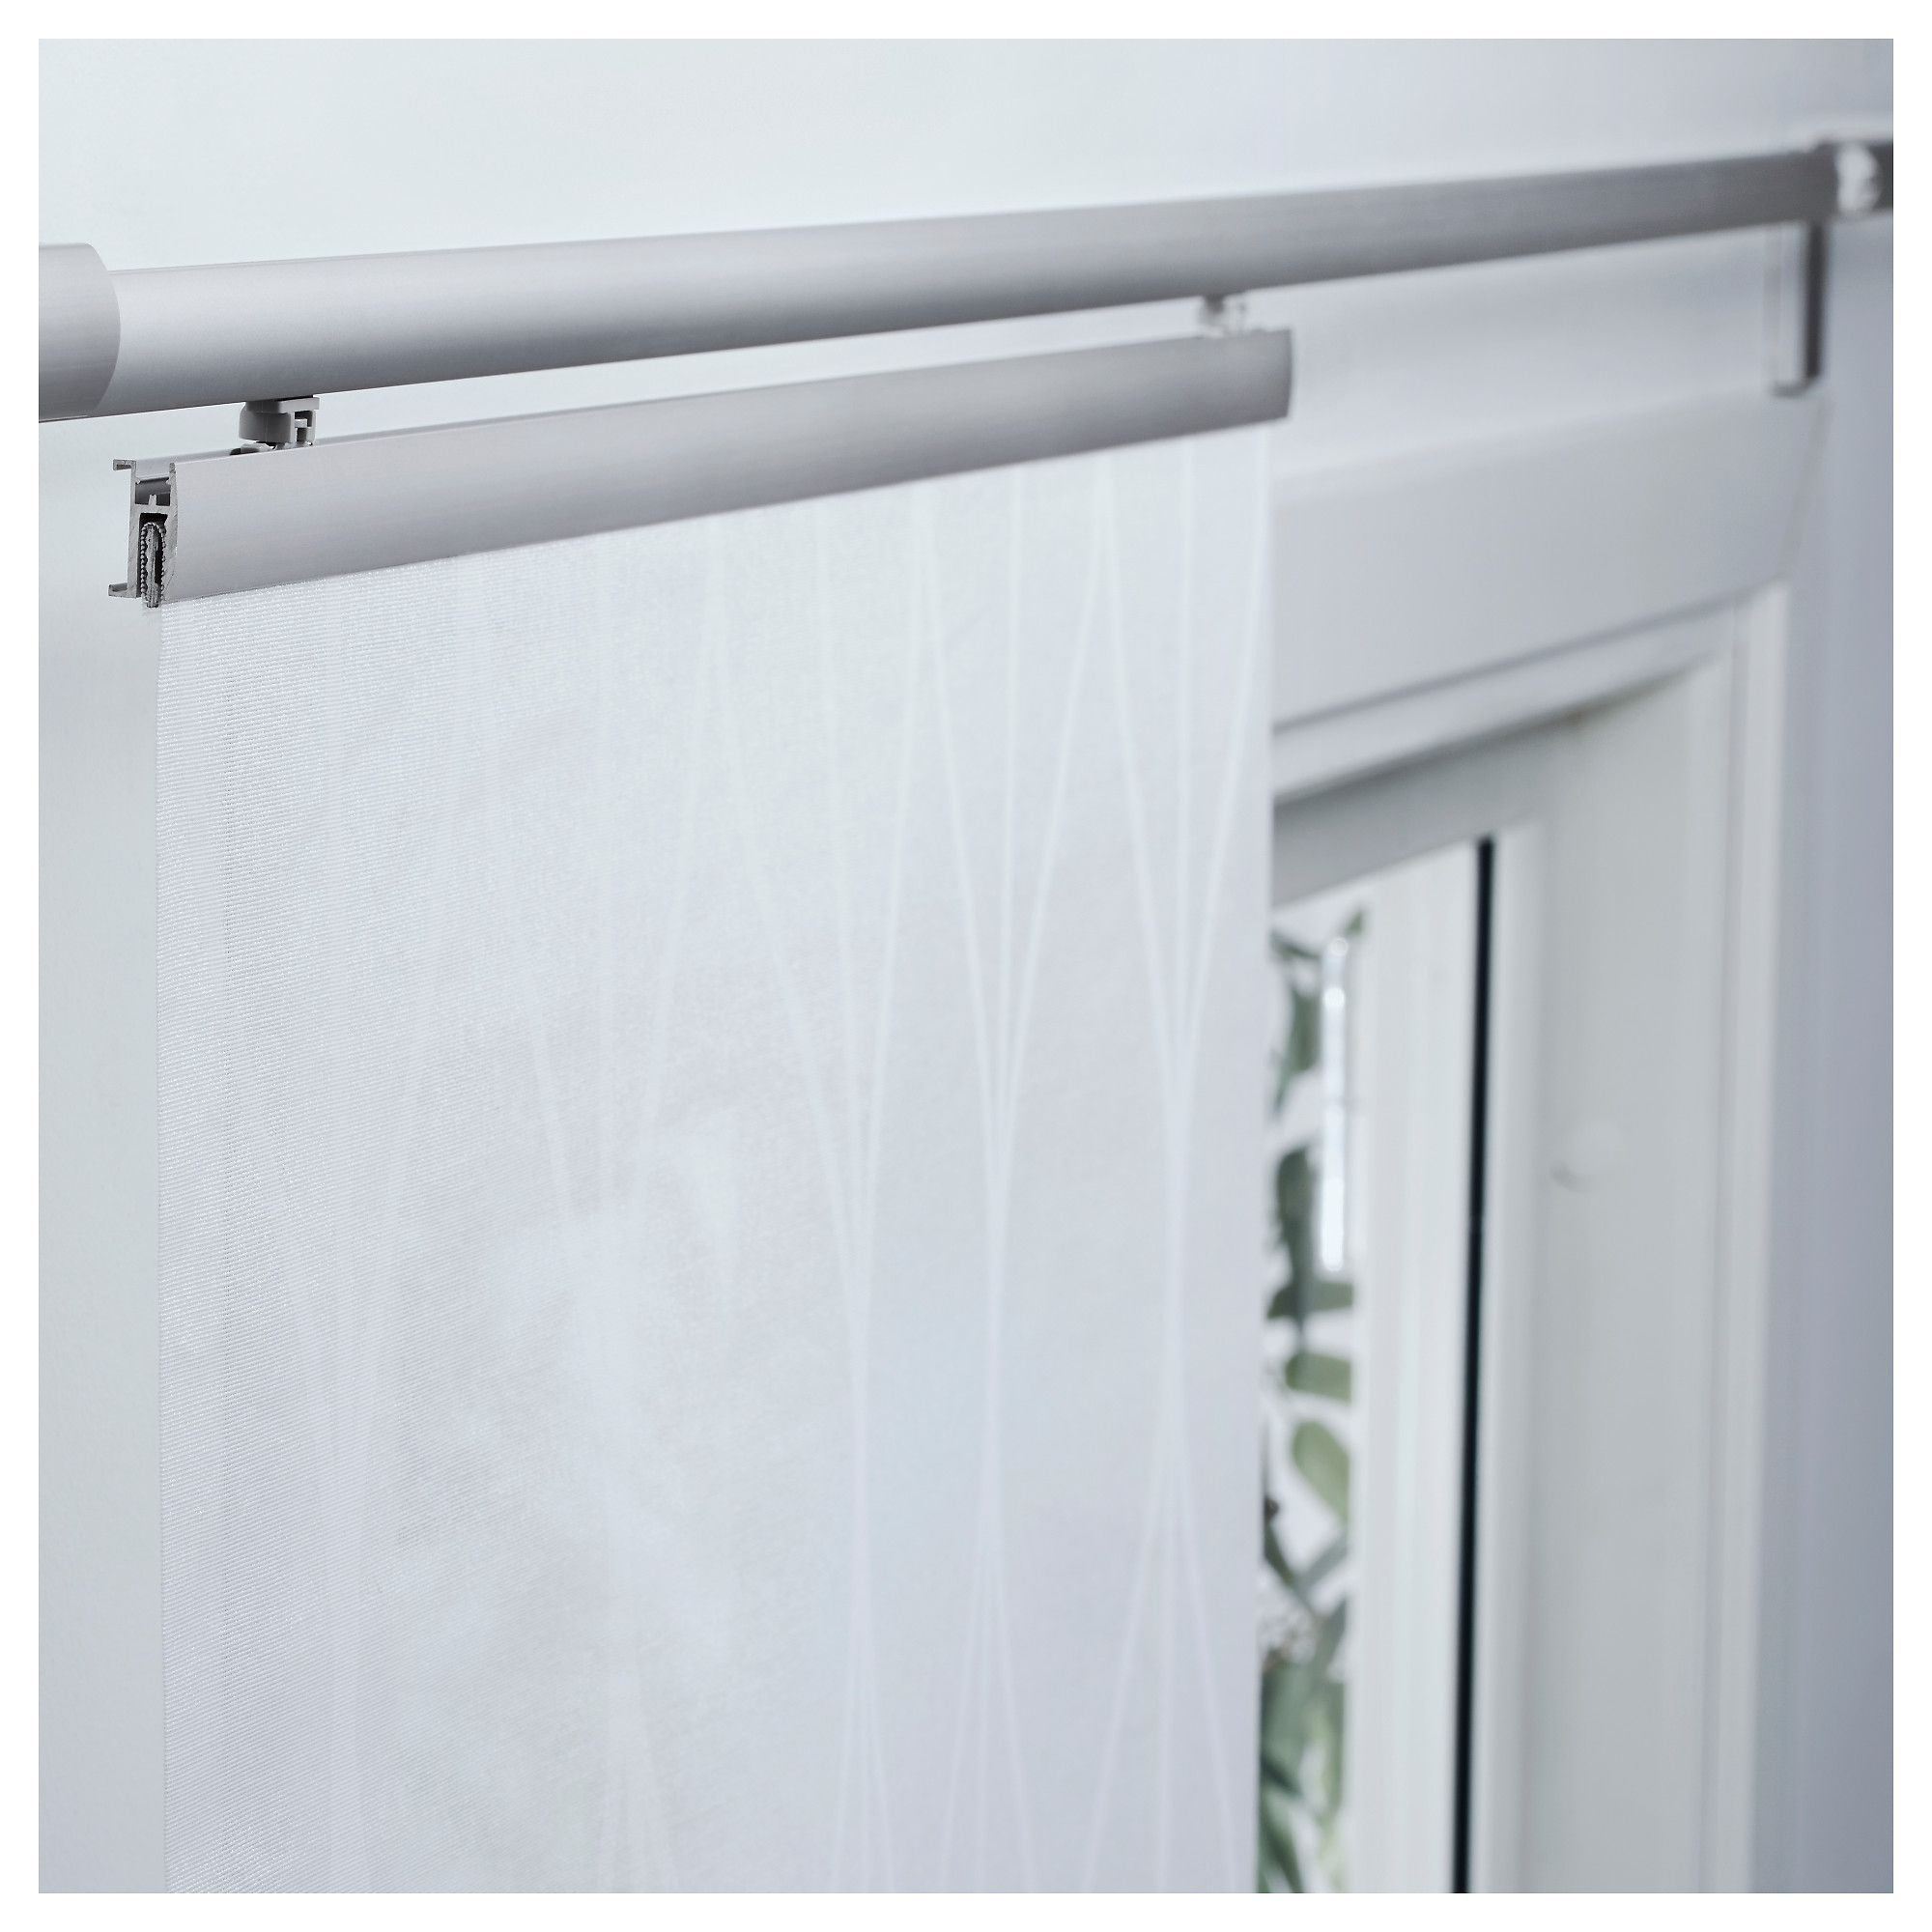 IKEA GRYNET Panel curtain white Sew curtains in Pinterest